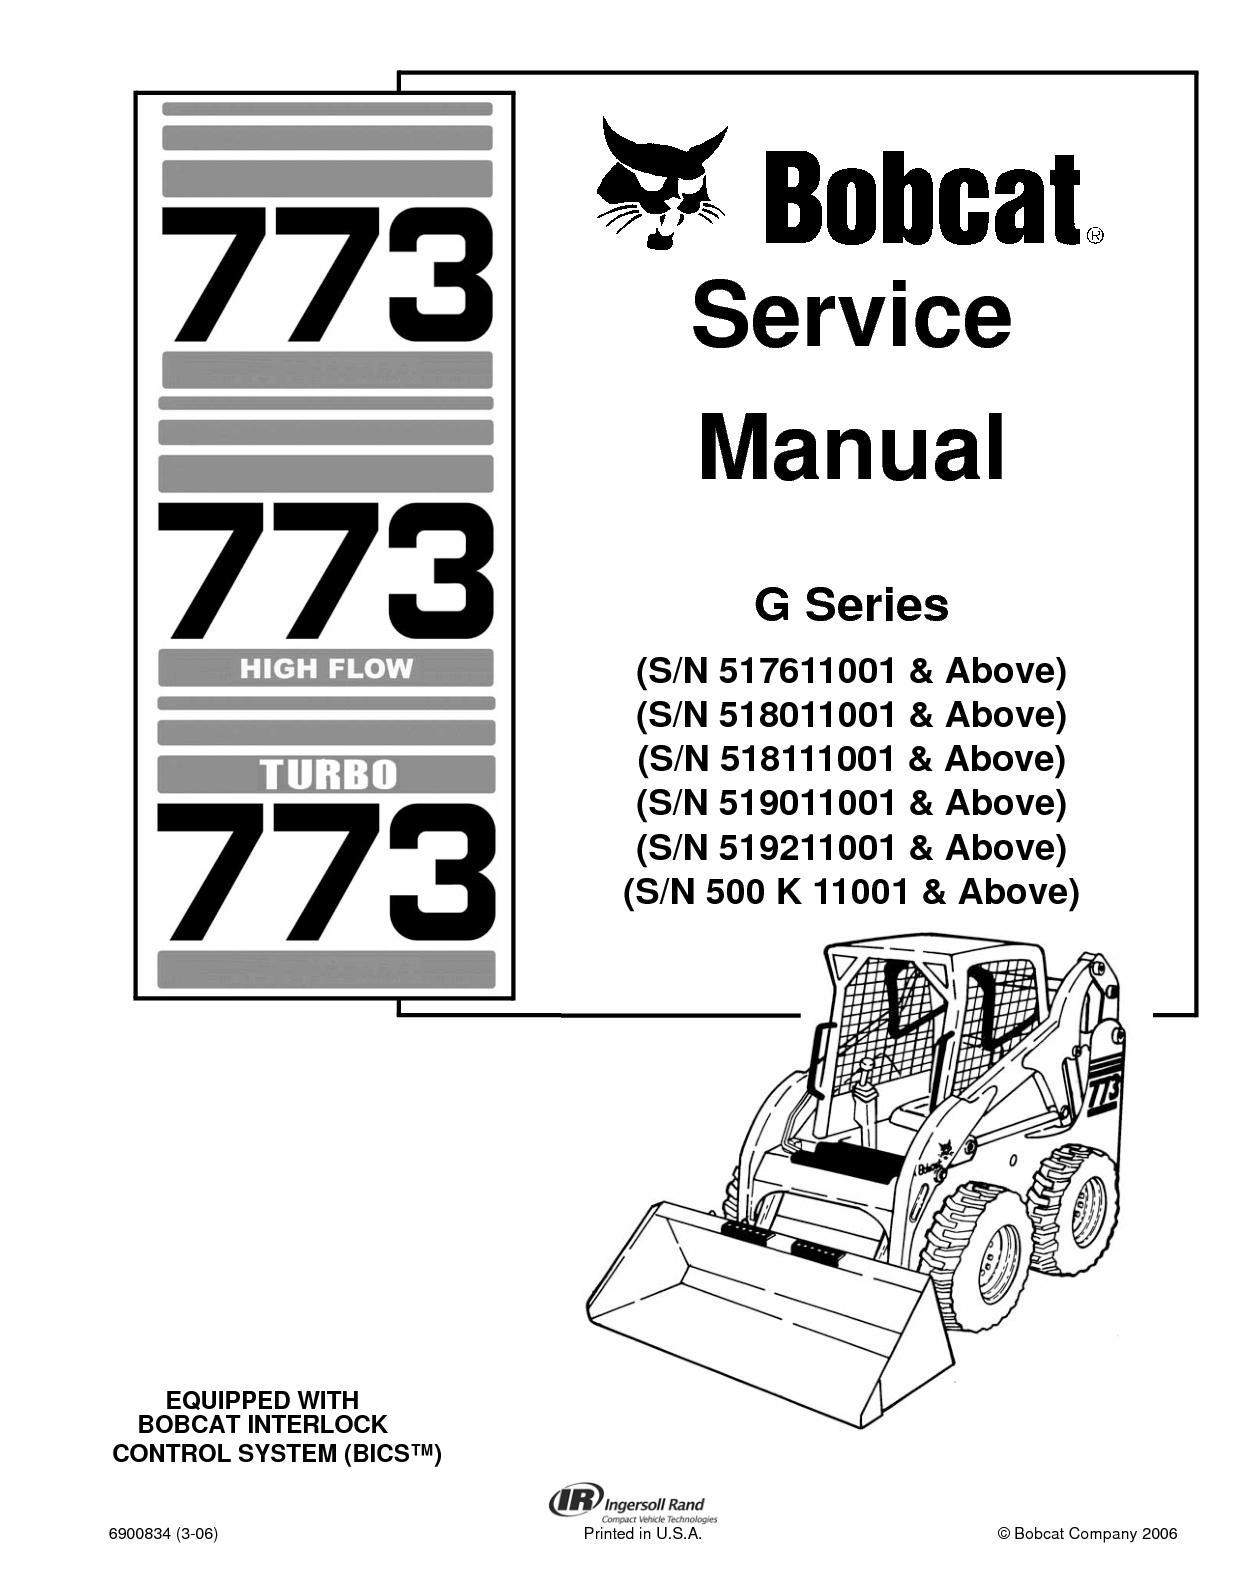 hight resolution of calam o bobcat 773 skid steer loader service repair manual sn 500 k 11001 above